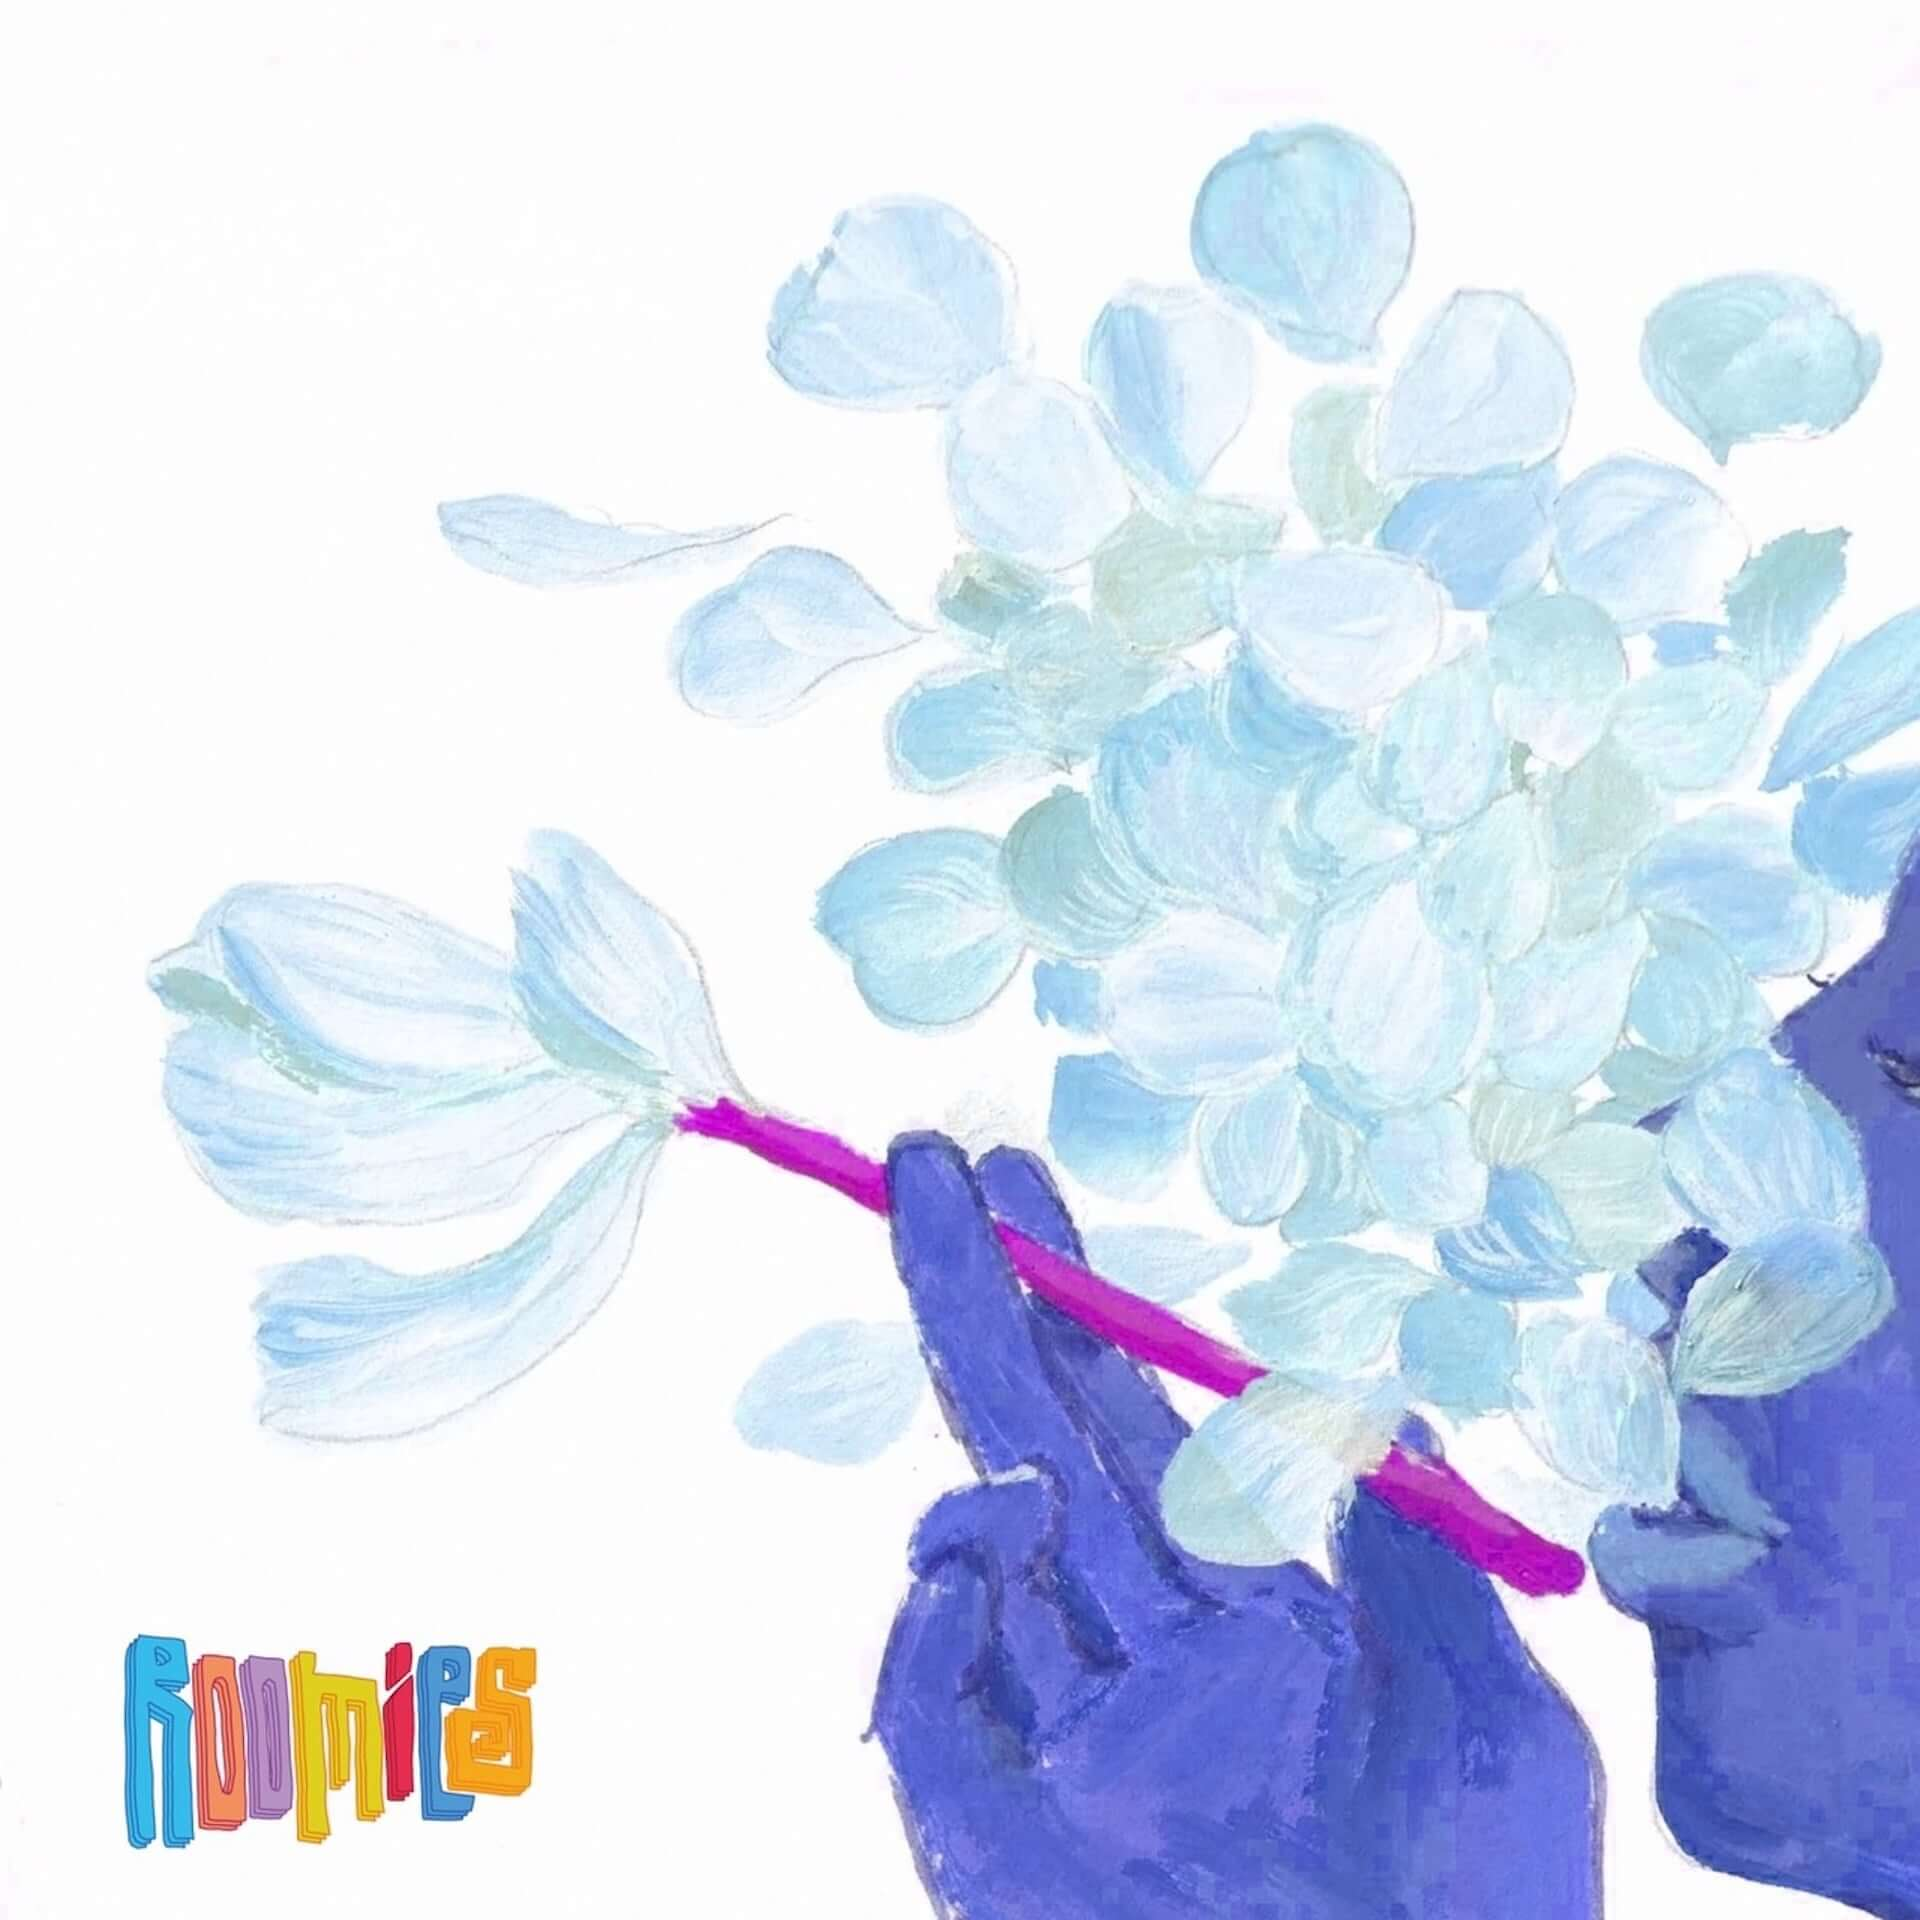 Roomiesのワンマンライブが渋谷WWWにて開催決定!新曲「In my Dream」も配信開始 music200323_roomies_www_1-1920x1920